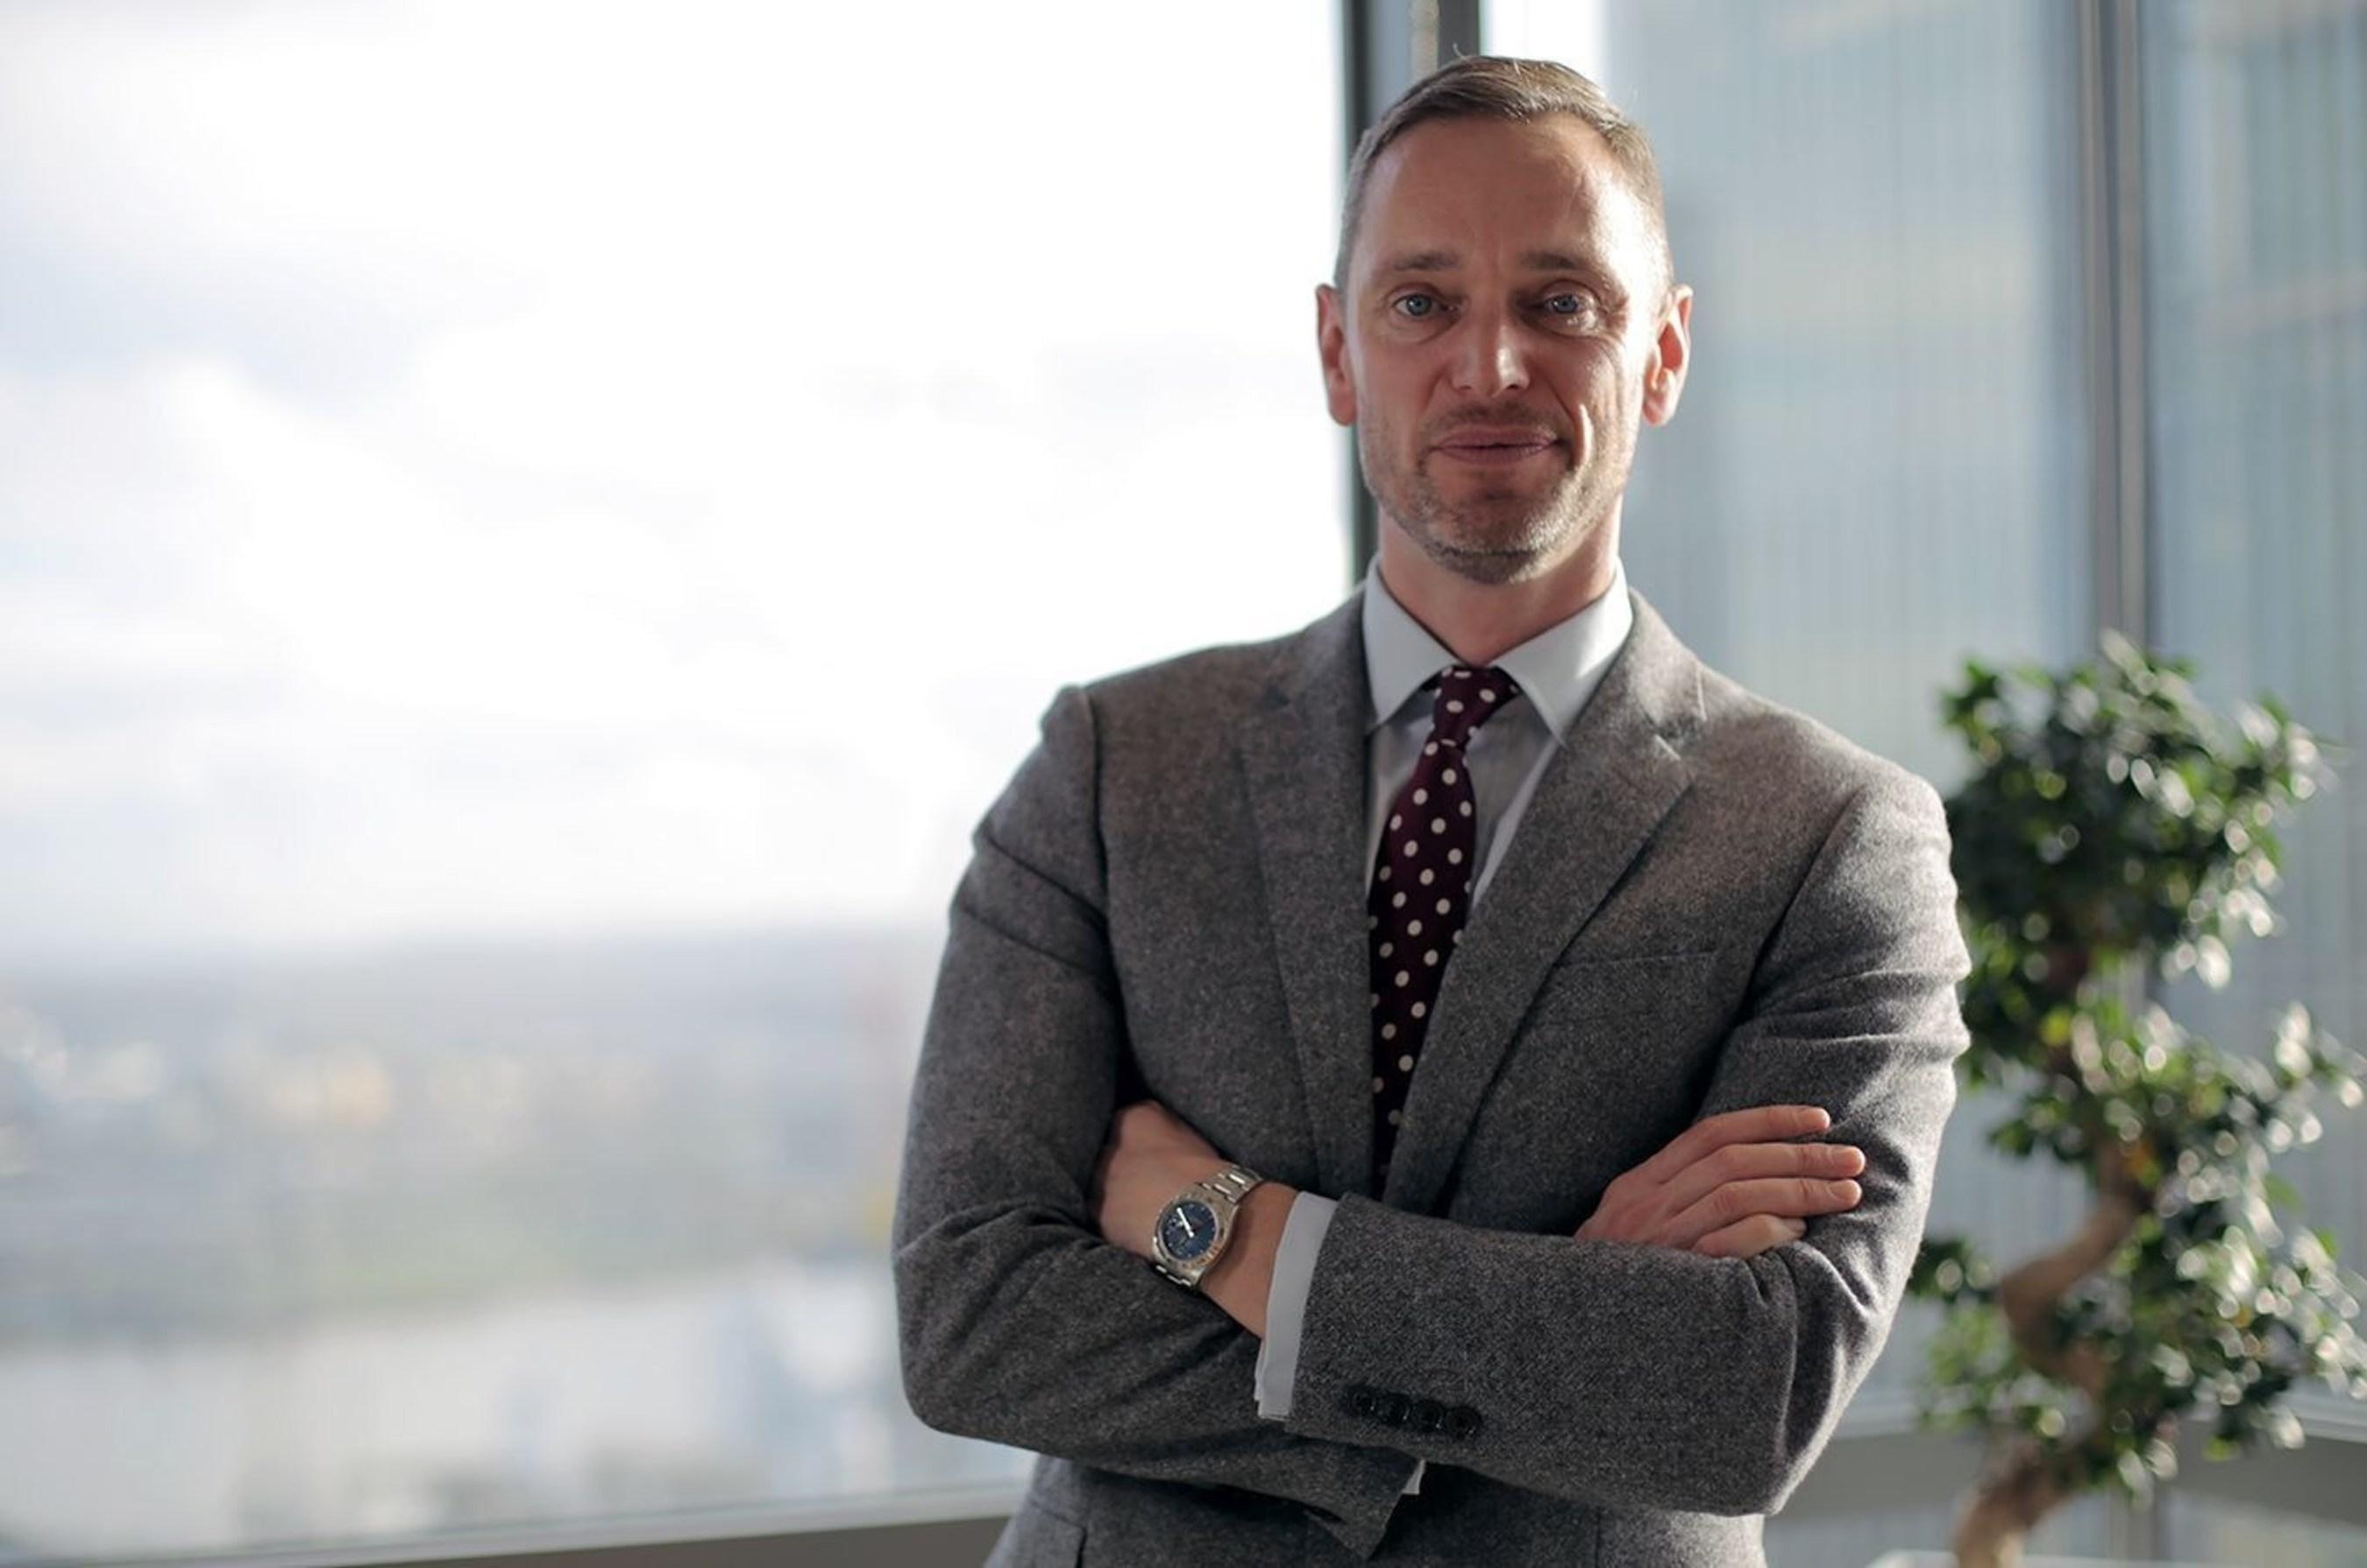 Greg Witham, Chief Operating Officer, IBT Media for UK and EMEA (PRNewsFoto/IBT Media) (PRNewsFoto/IBT Media)